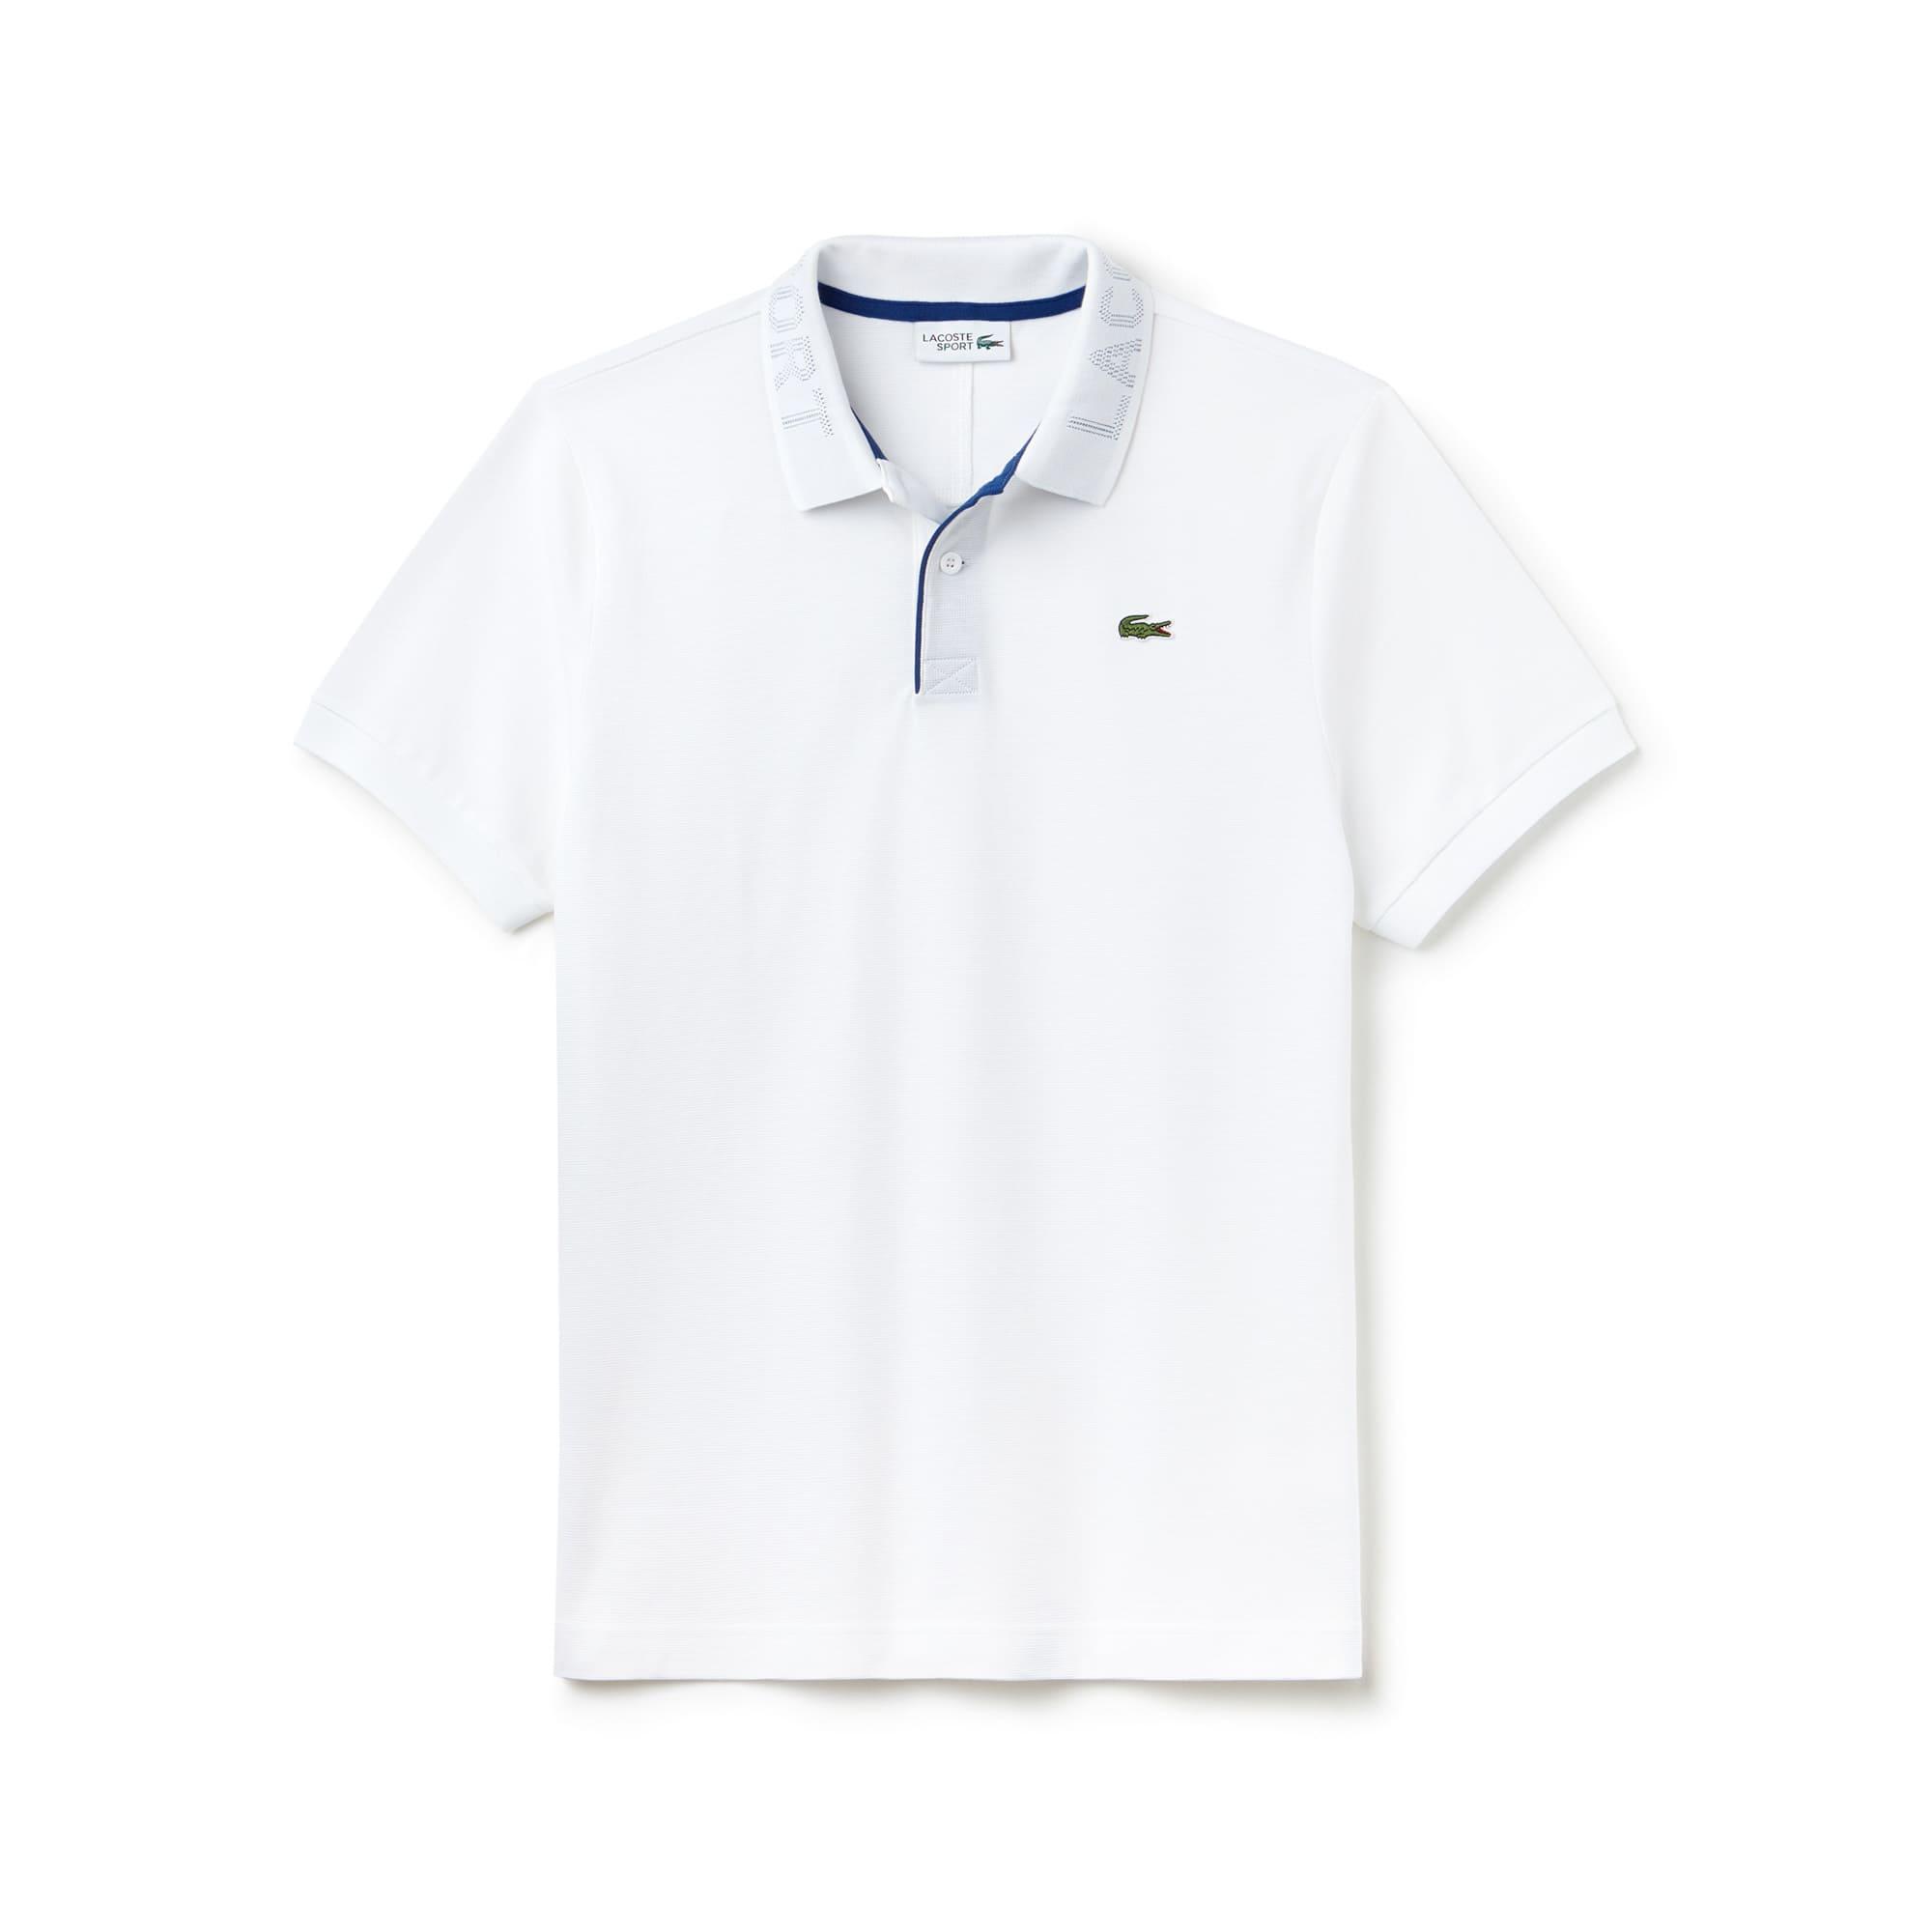 Herren LACOSTE SPORT Tennis Poloshirt mit bedrucktem Kragen